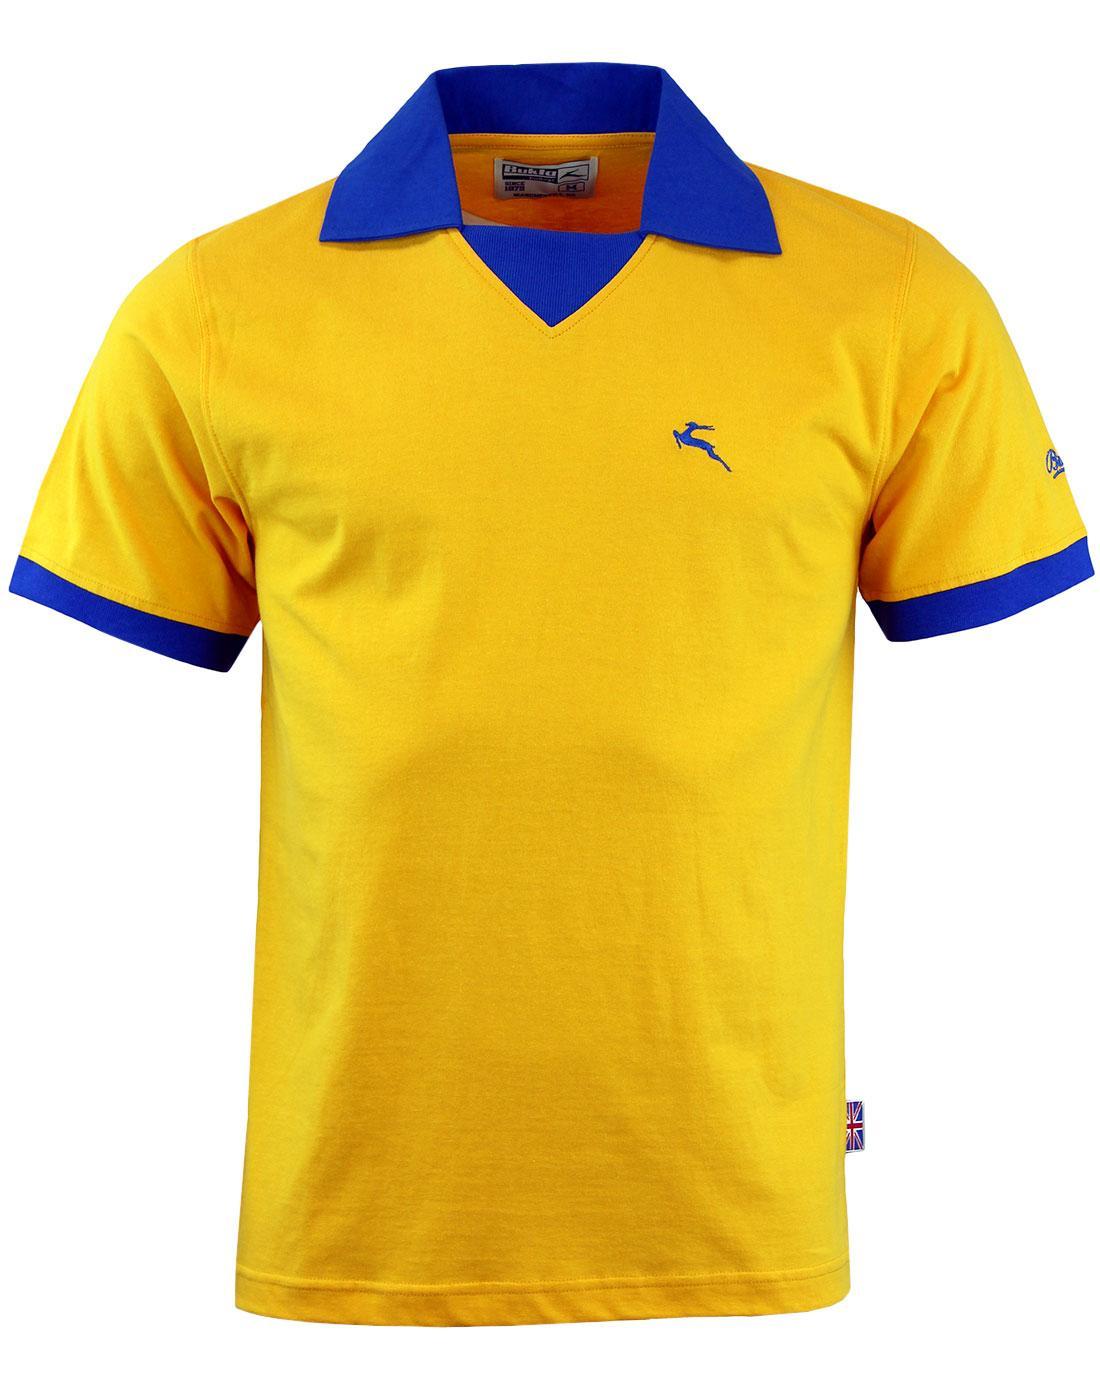 'Portland' -Bukta Vintage Retro Football Shirt (A)